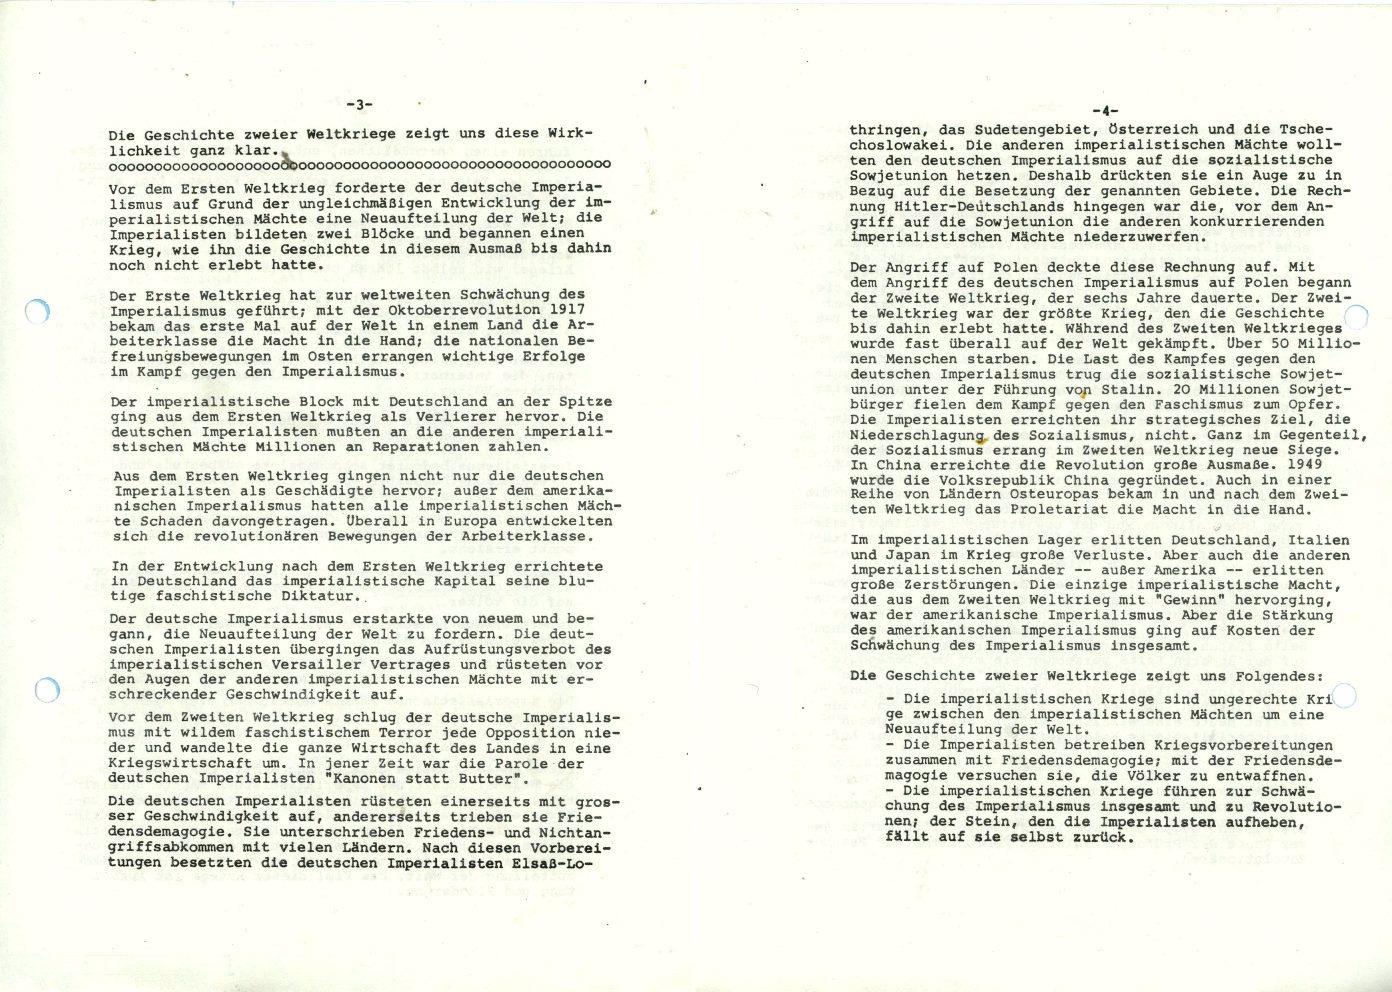 TKPML_1977_03_03